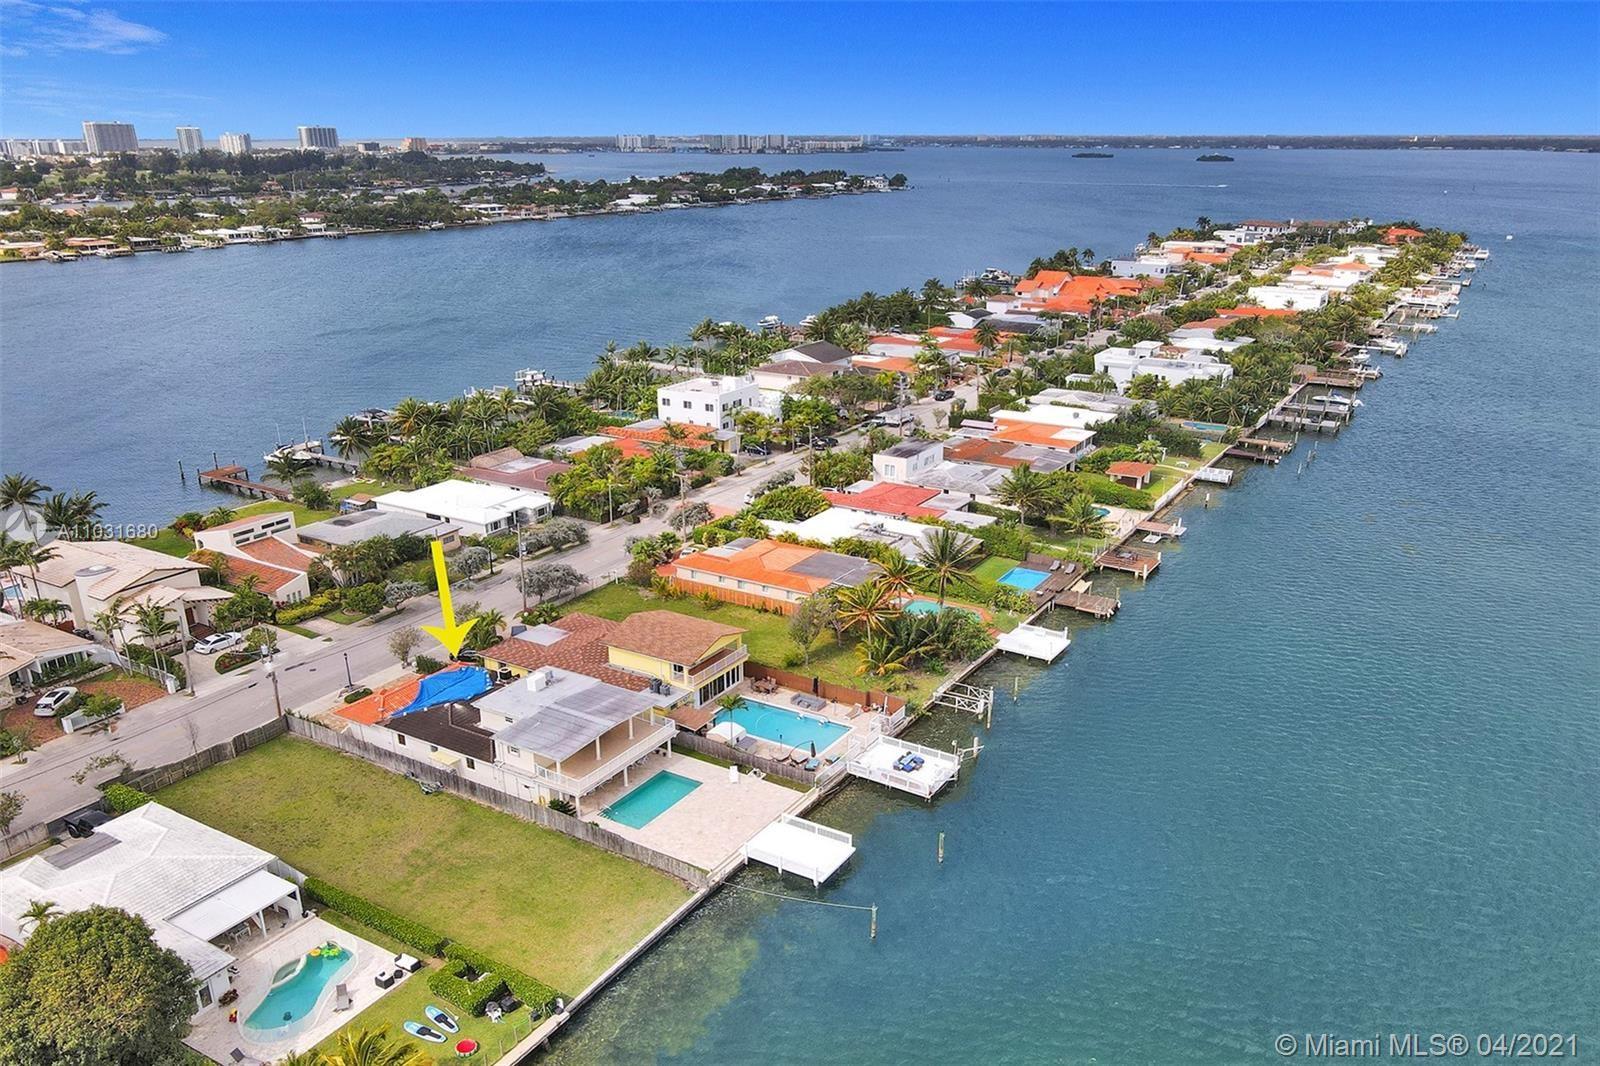 1171 Stillwater Dr, Miami Beach, FL 33141 - #: A11031680